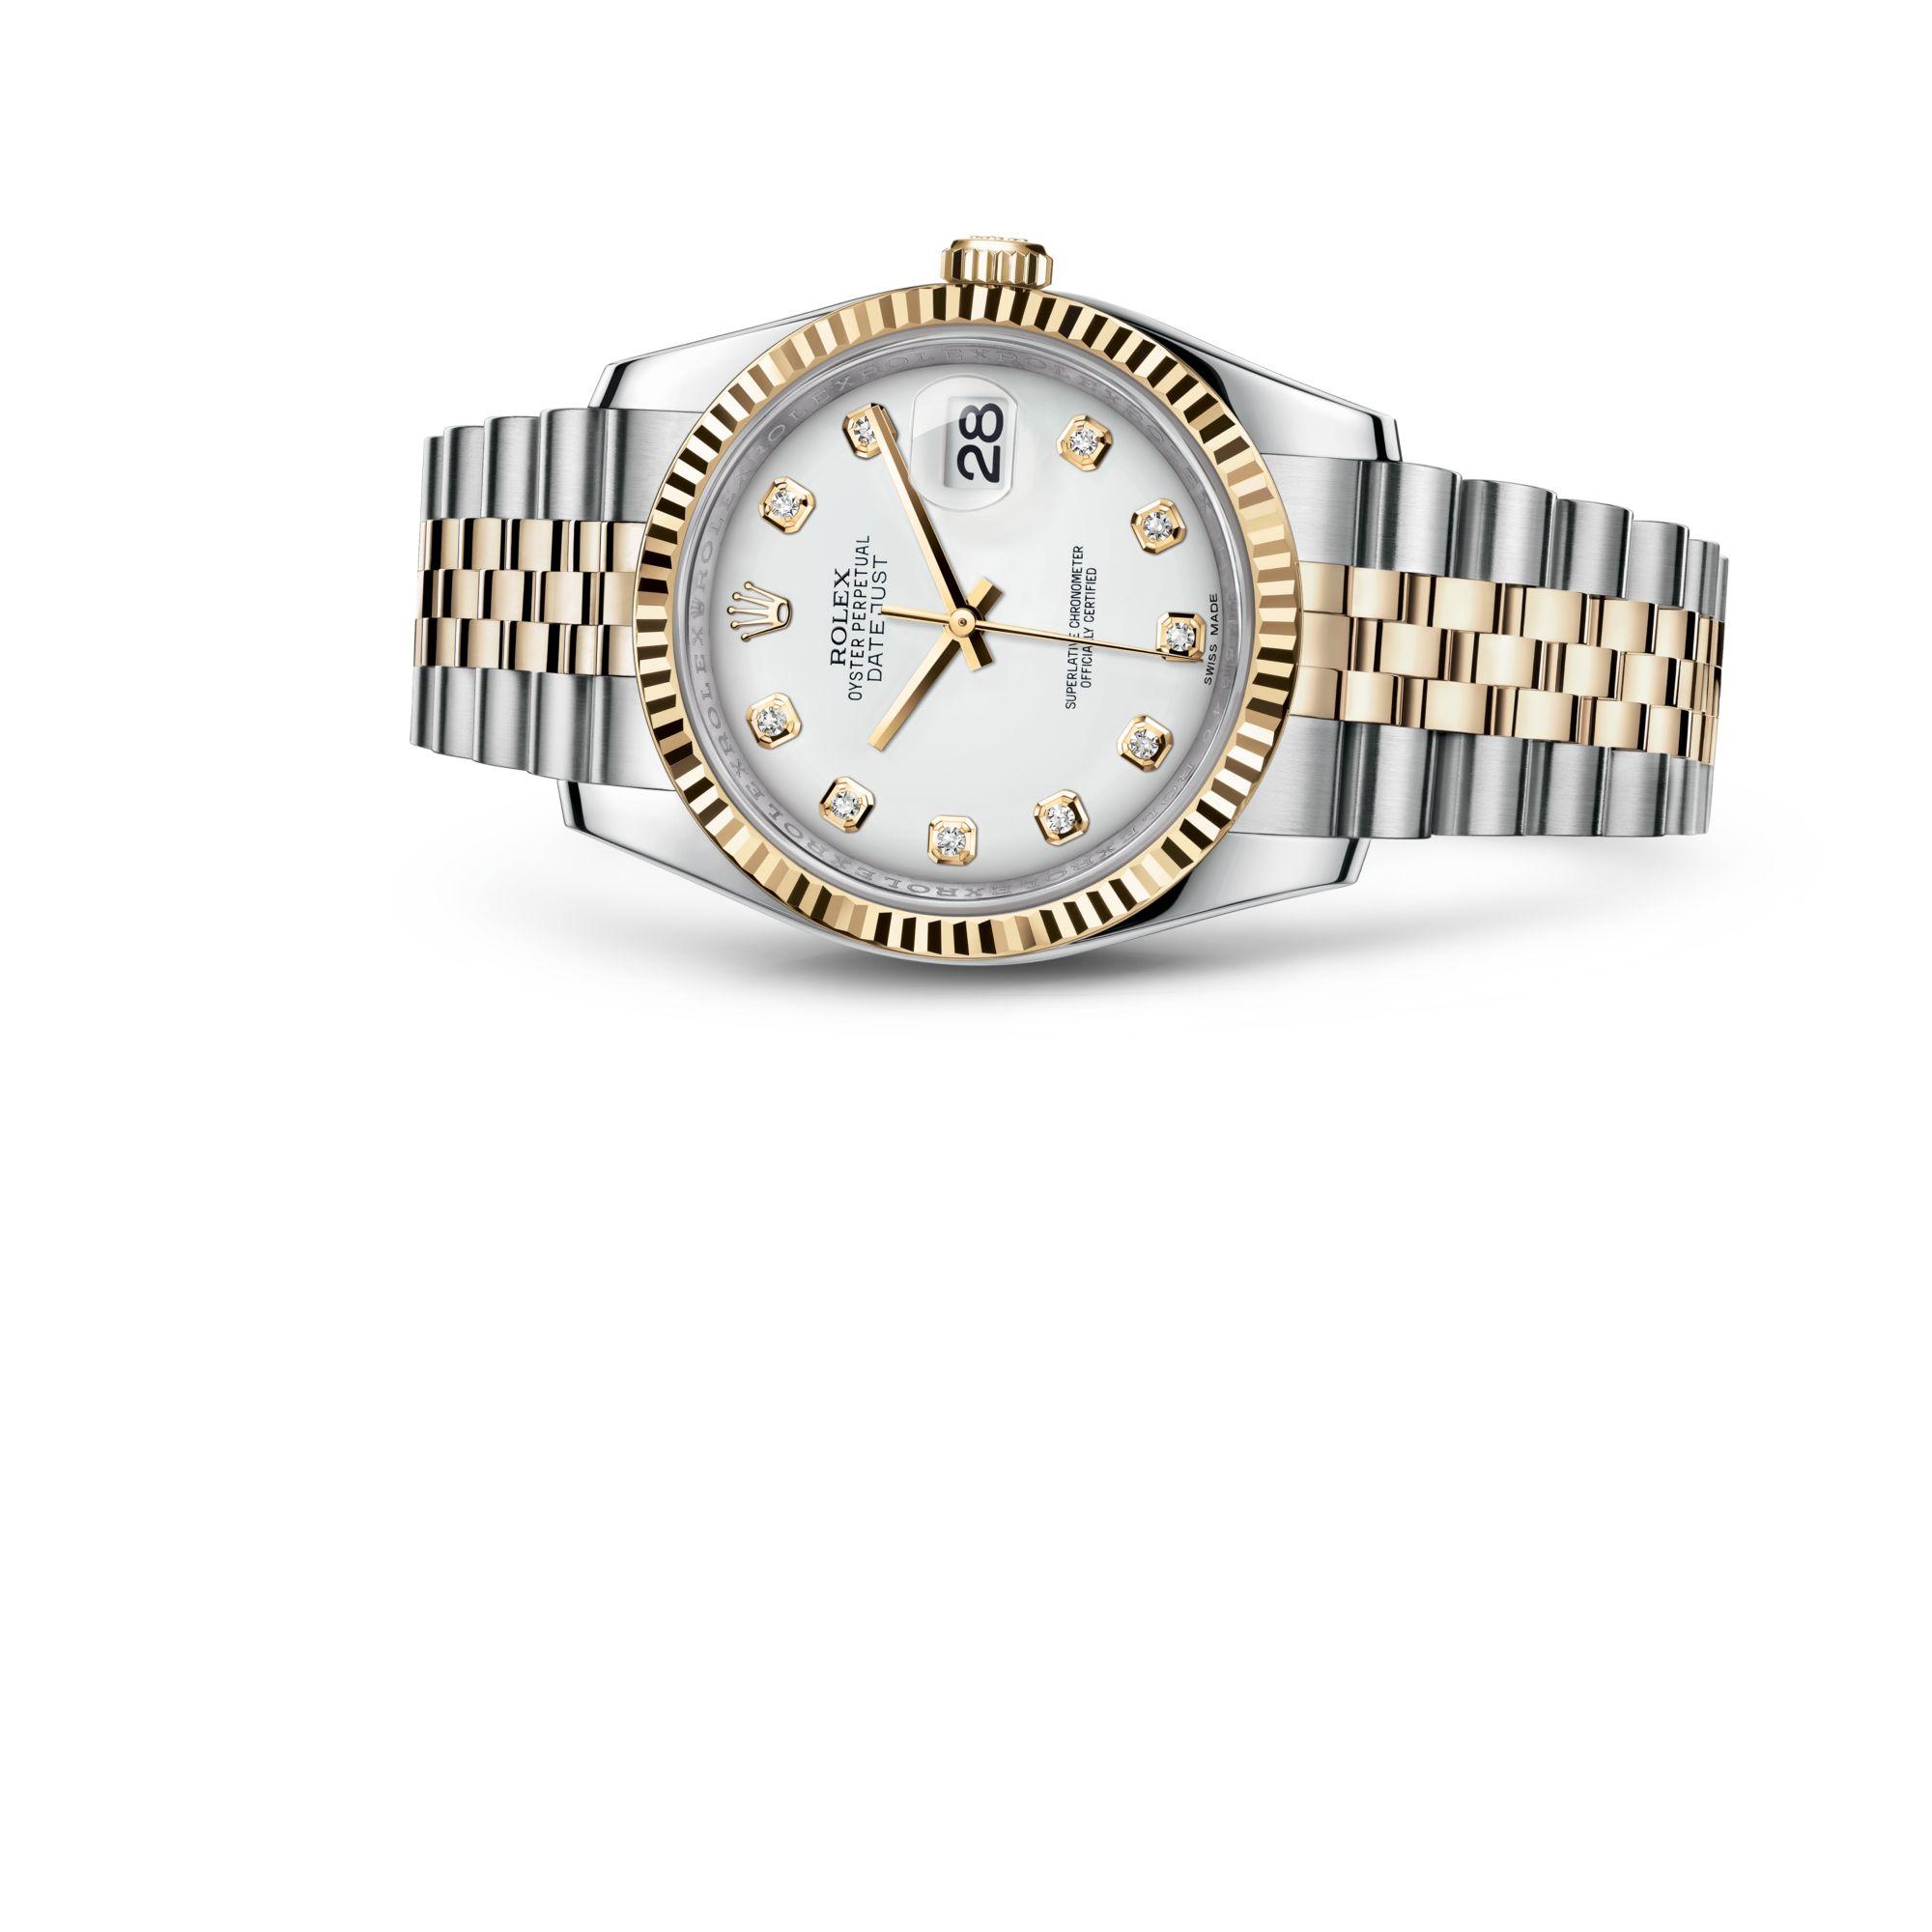 Rolex ديت جست ۳٦ M116233-0154